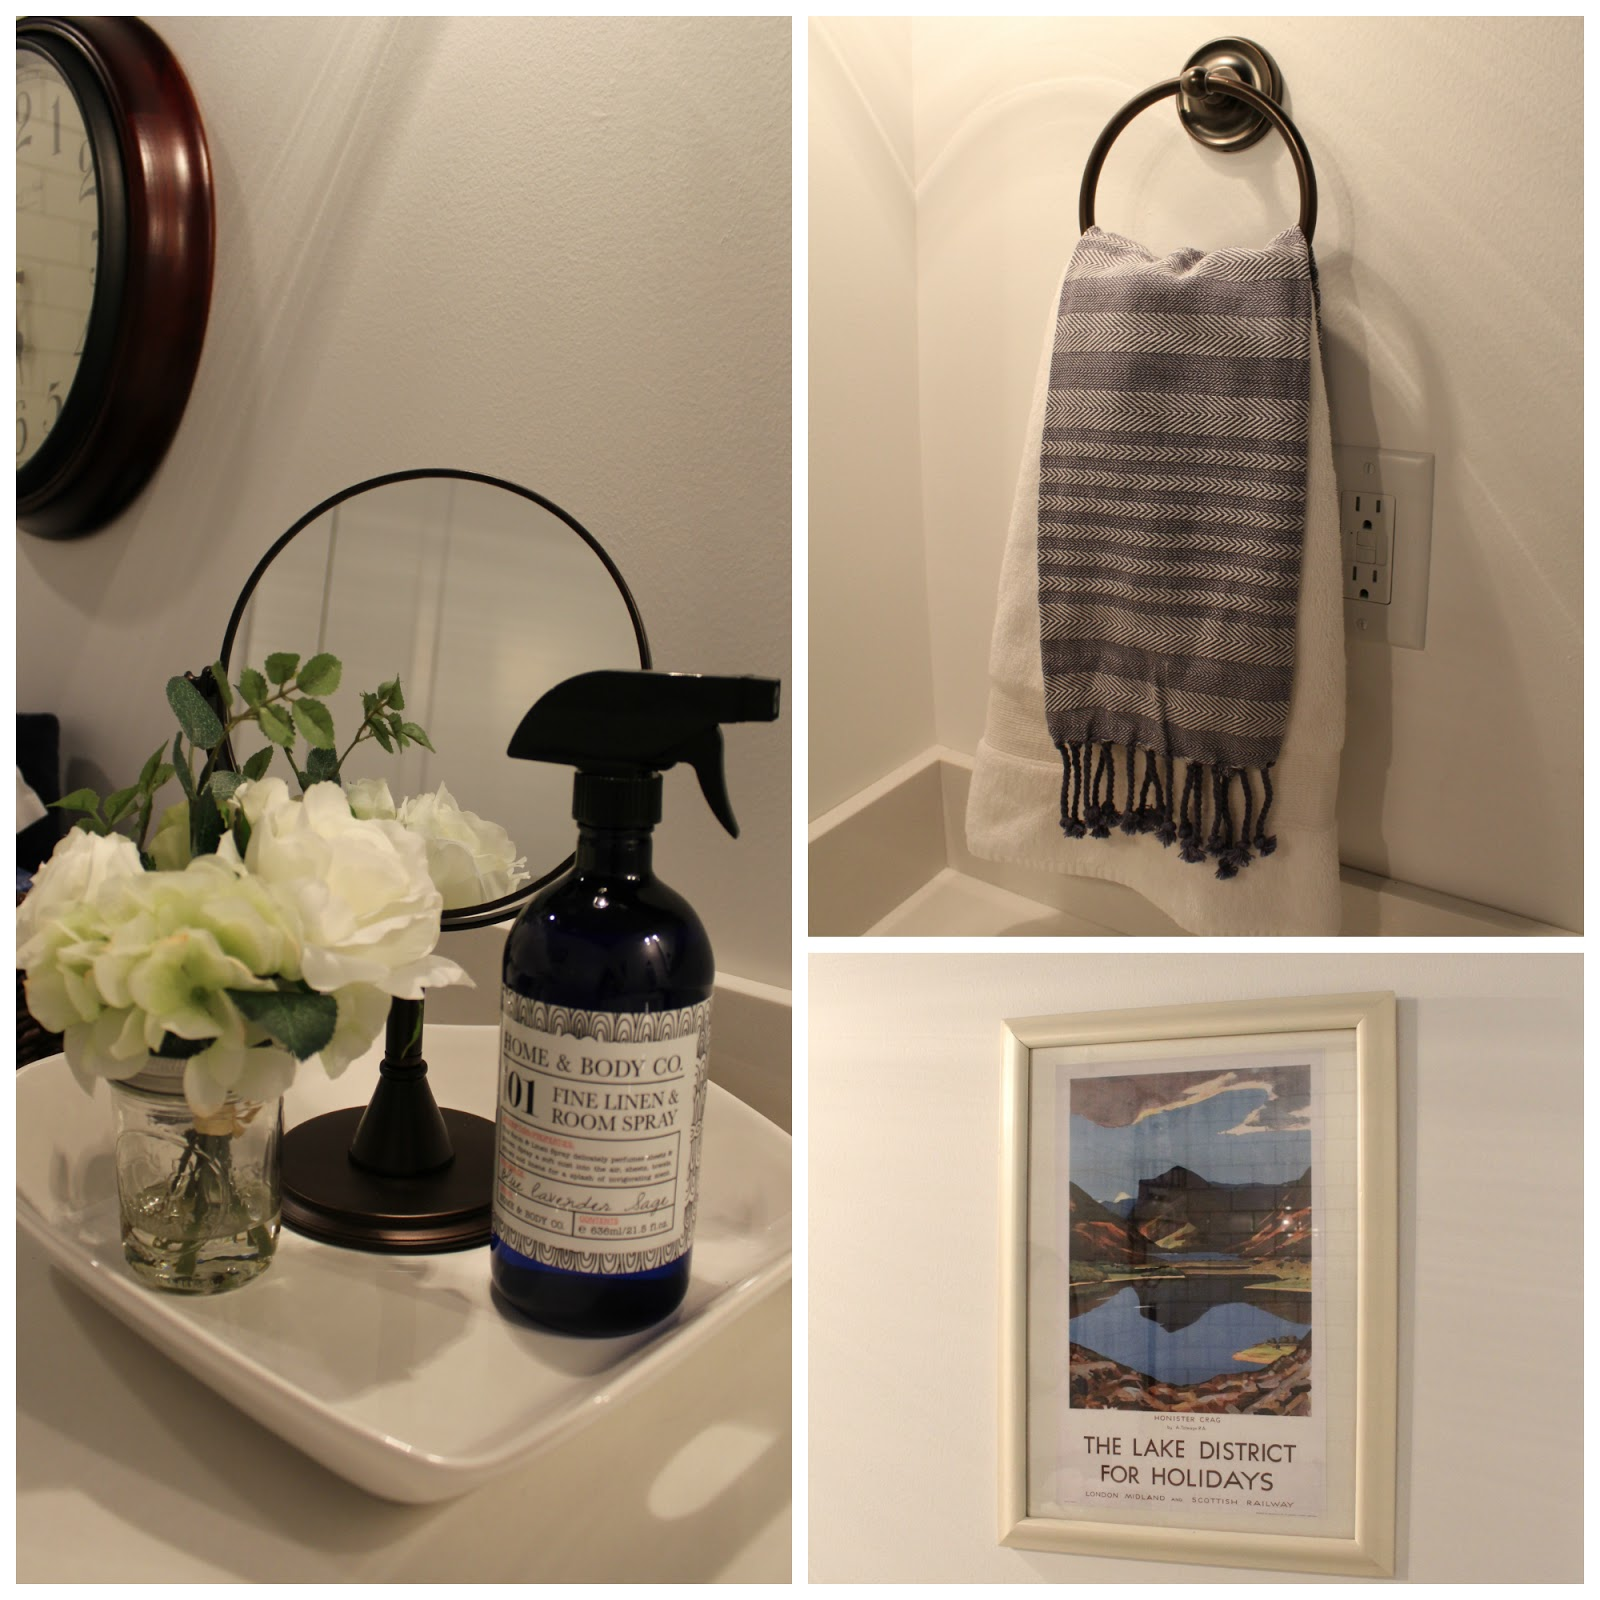 Navy Blue Bathroom Wall Art: Honey I'm Home: Navy Blue Bathroom